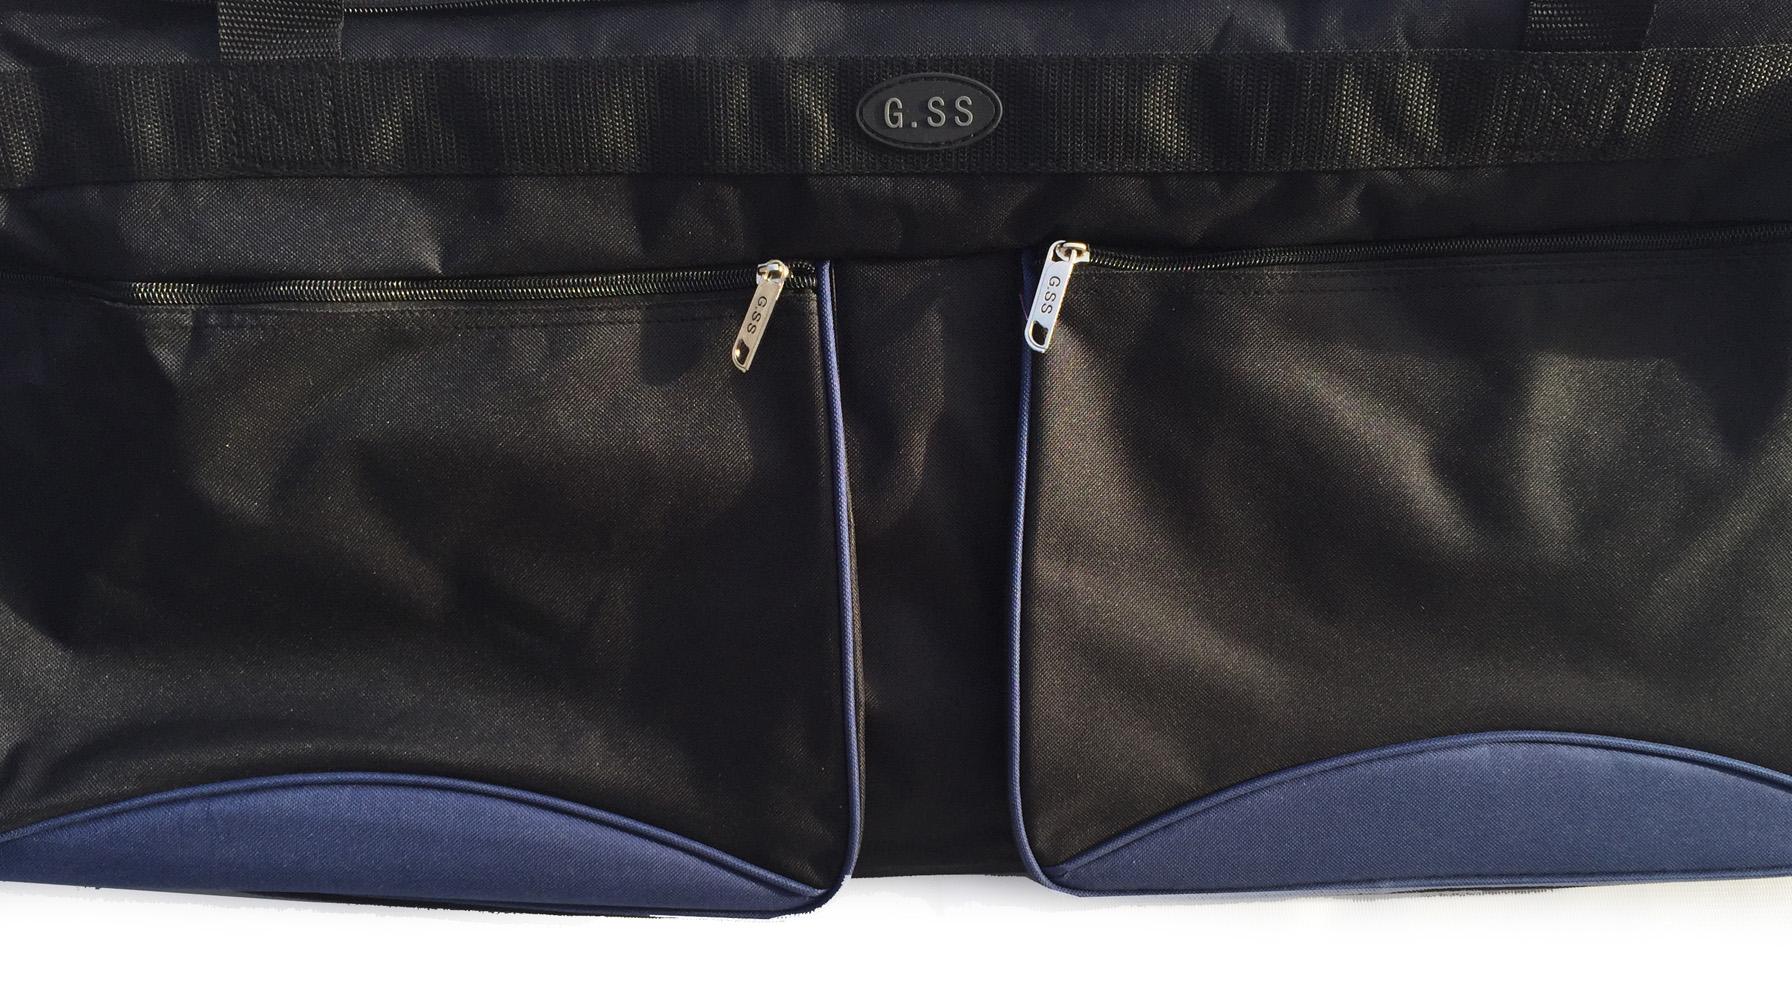 double pocket on the side of big blue bag